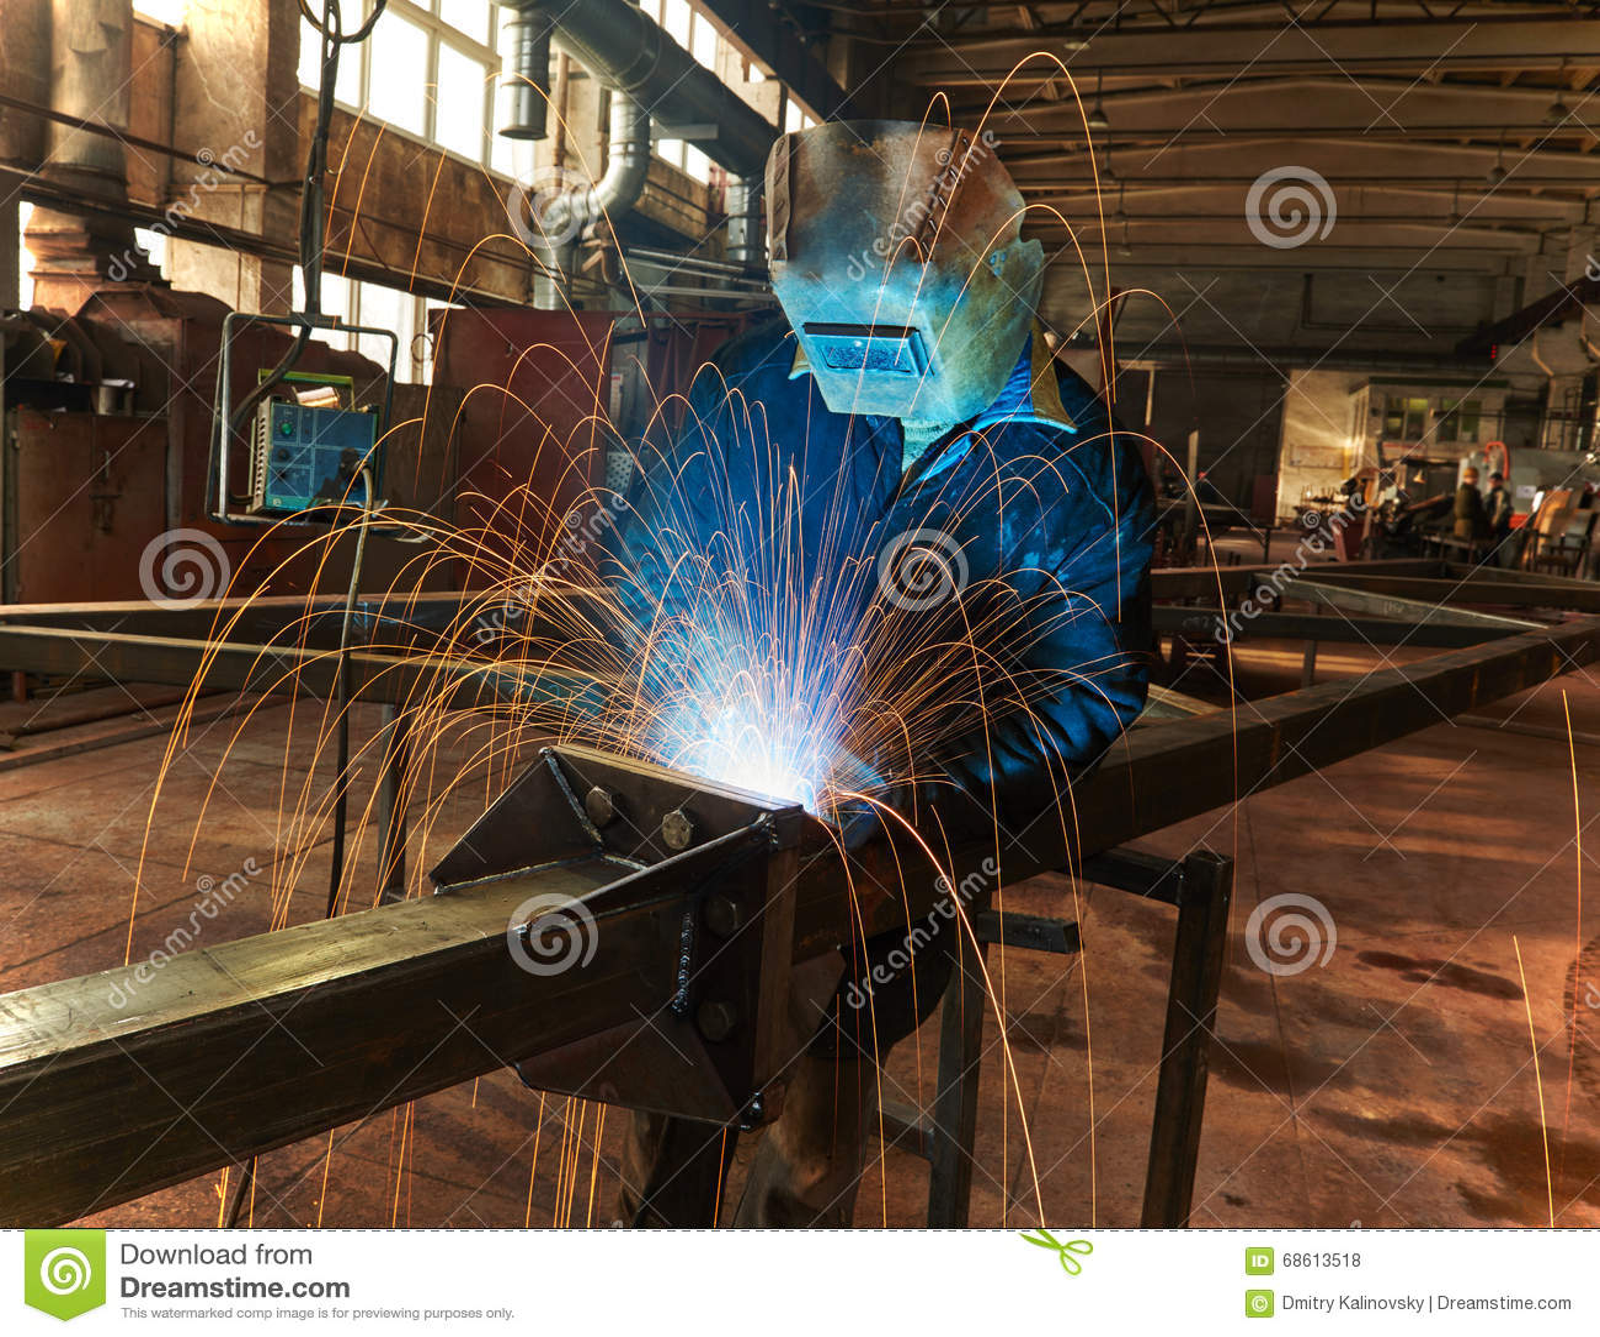 Lavoro industriale della saldatura ad arco